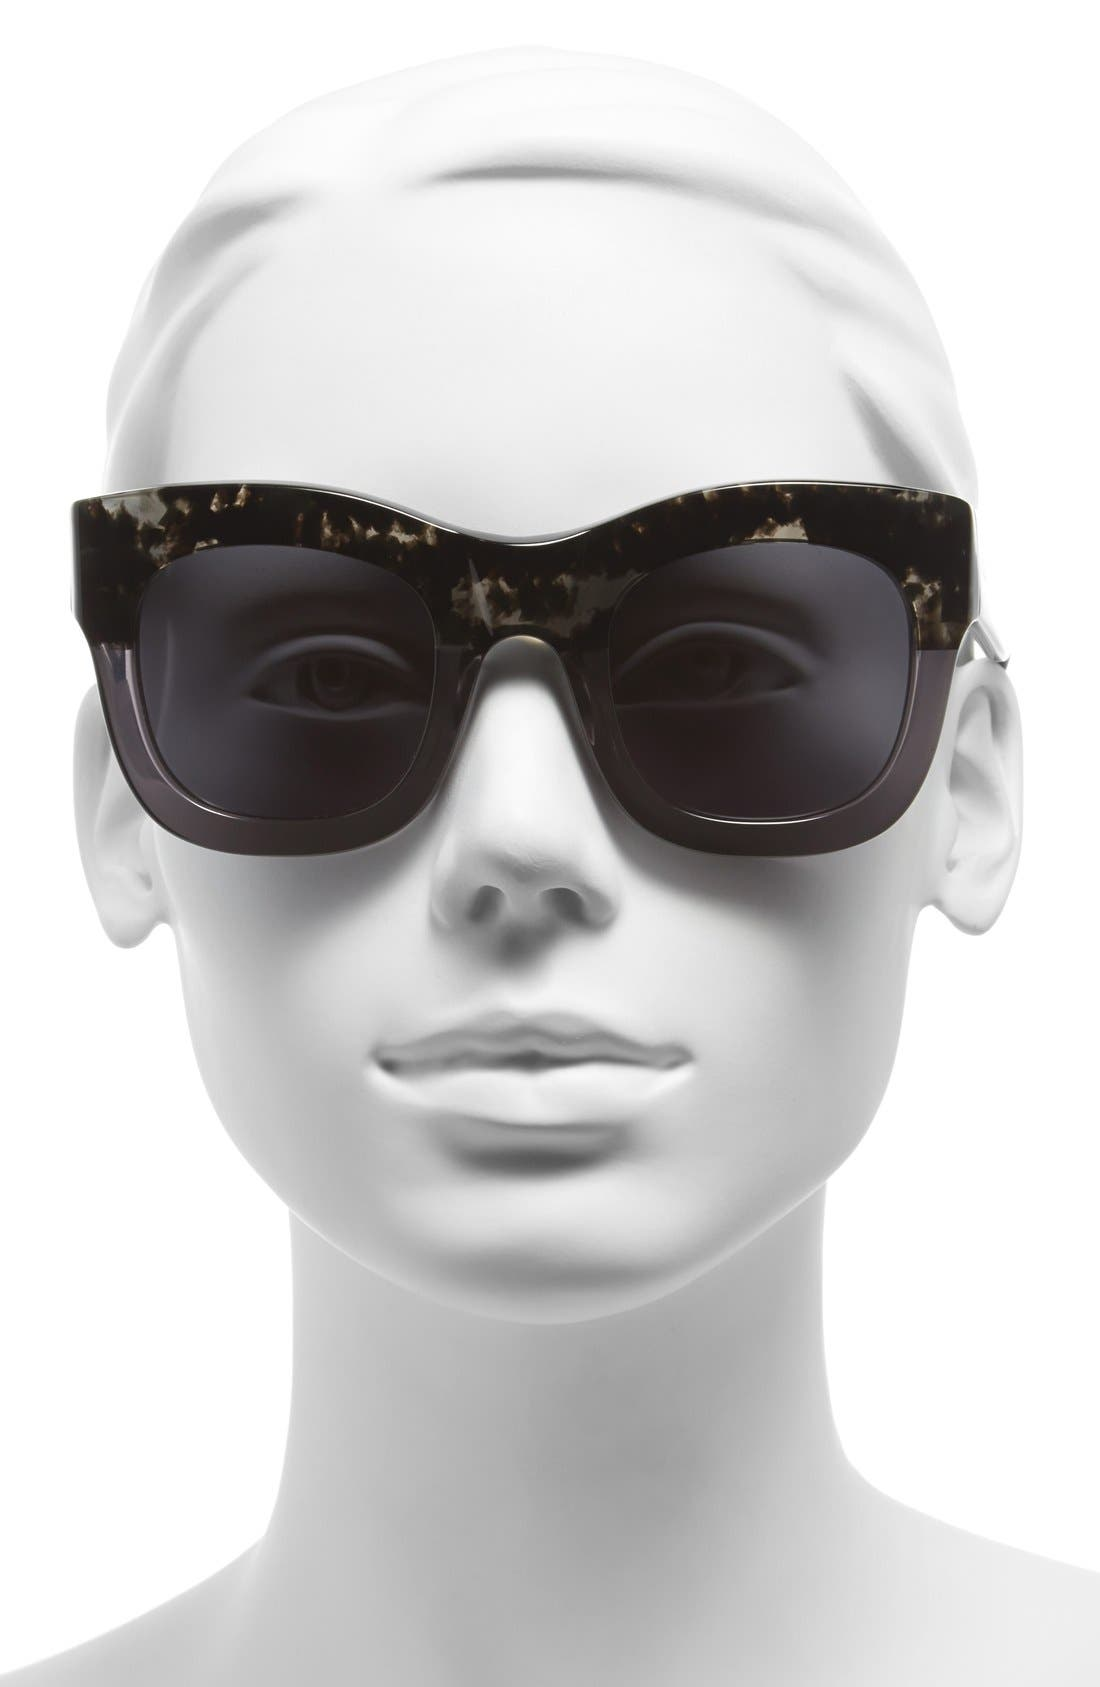 'Hamilton' 49mm Retro Sunglasses,                             Alternate thumbnail 14, color,